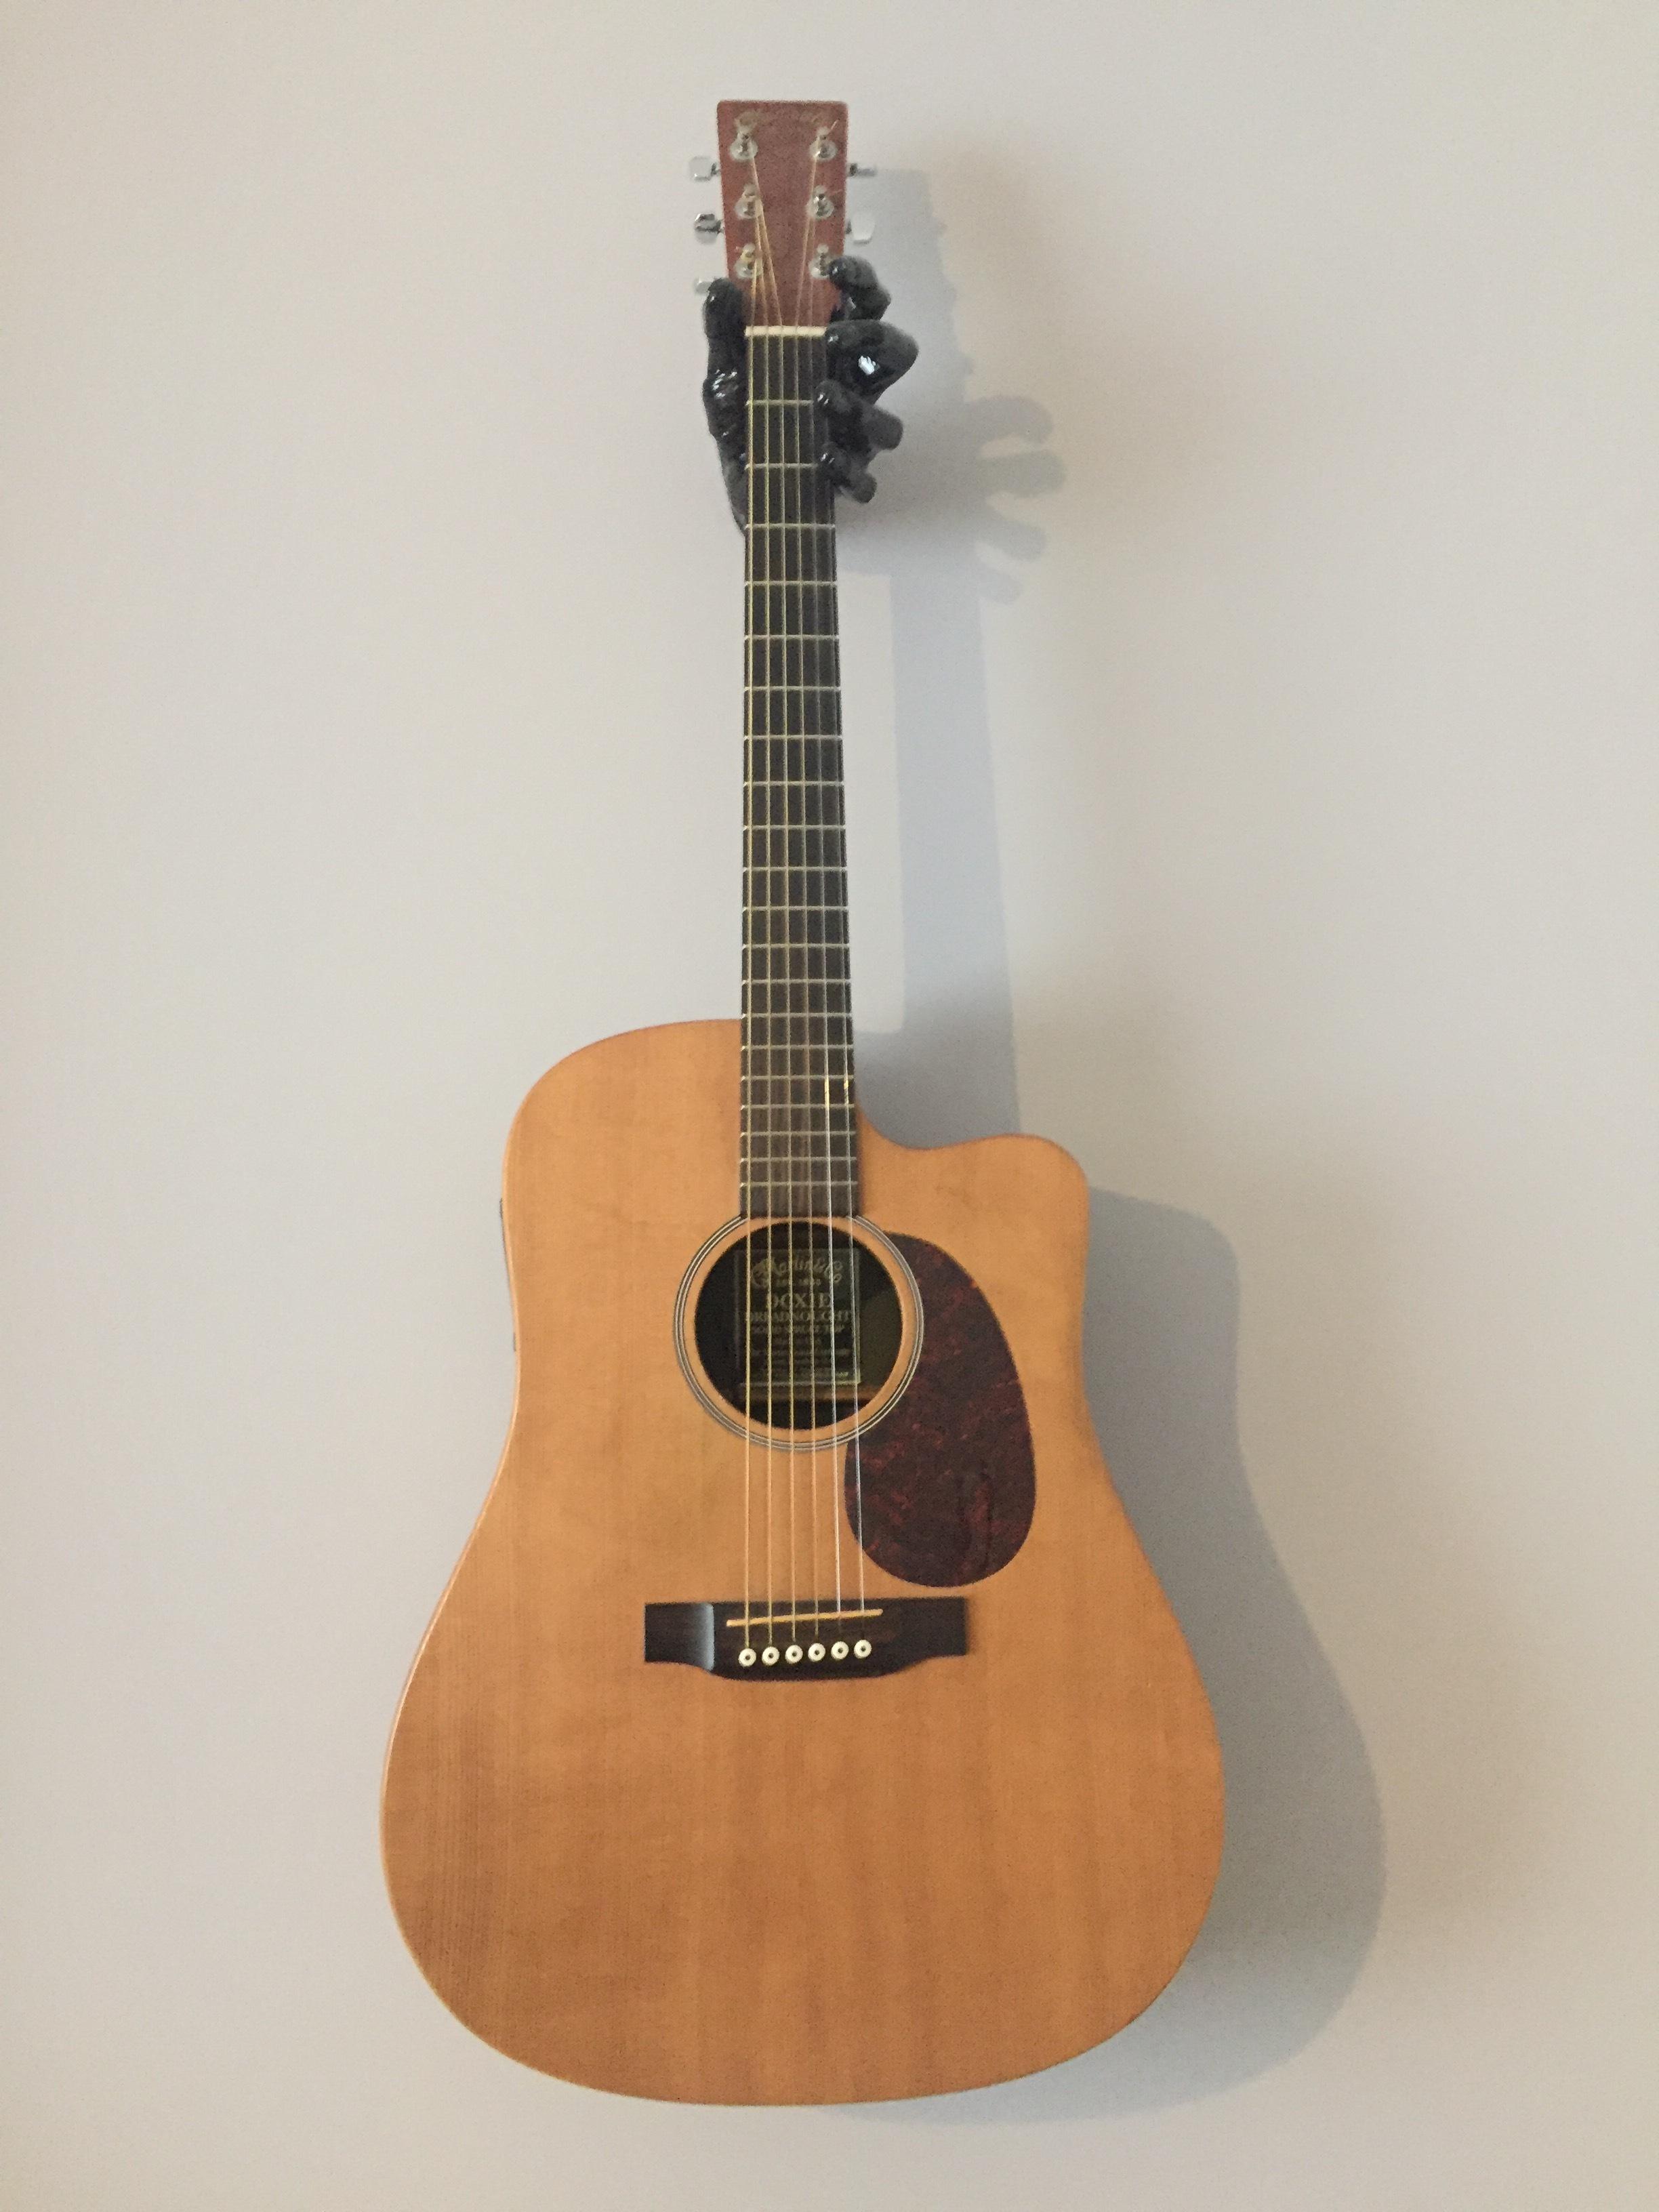 guitare martin lectro acoustique dcx1e nord pas de. Black Bedroom Furniture Sets. Home Design Ideas